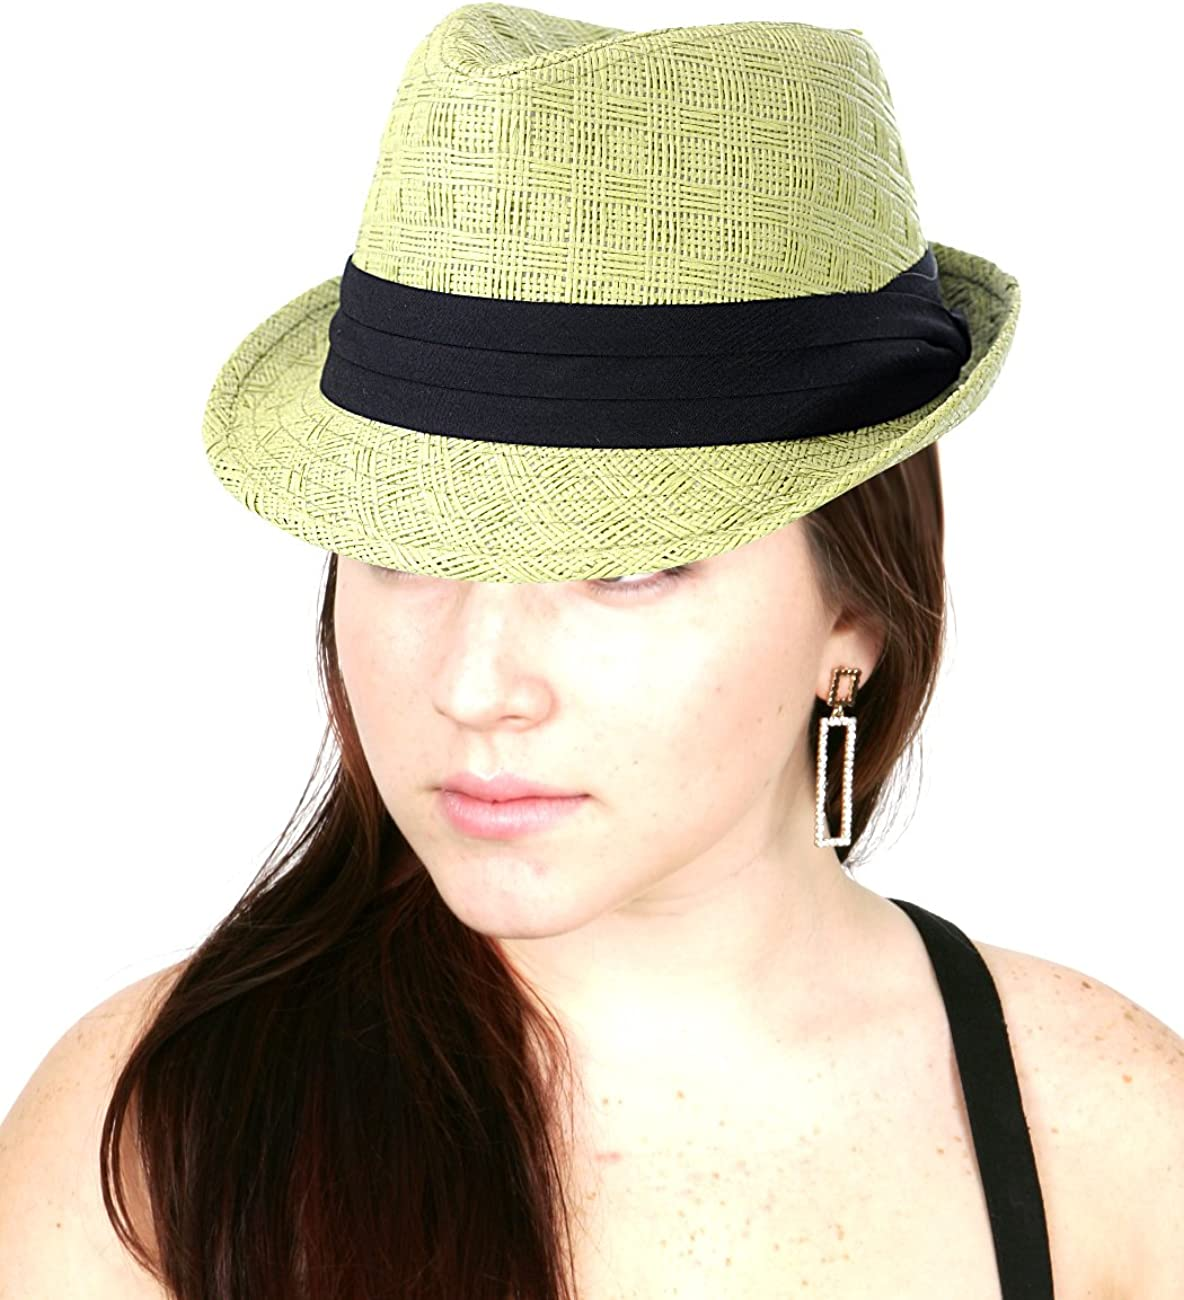 NYFASHION101 Women's Paper Woven Straw Fedora Hat w/ 3 Tier Band